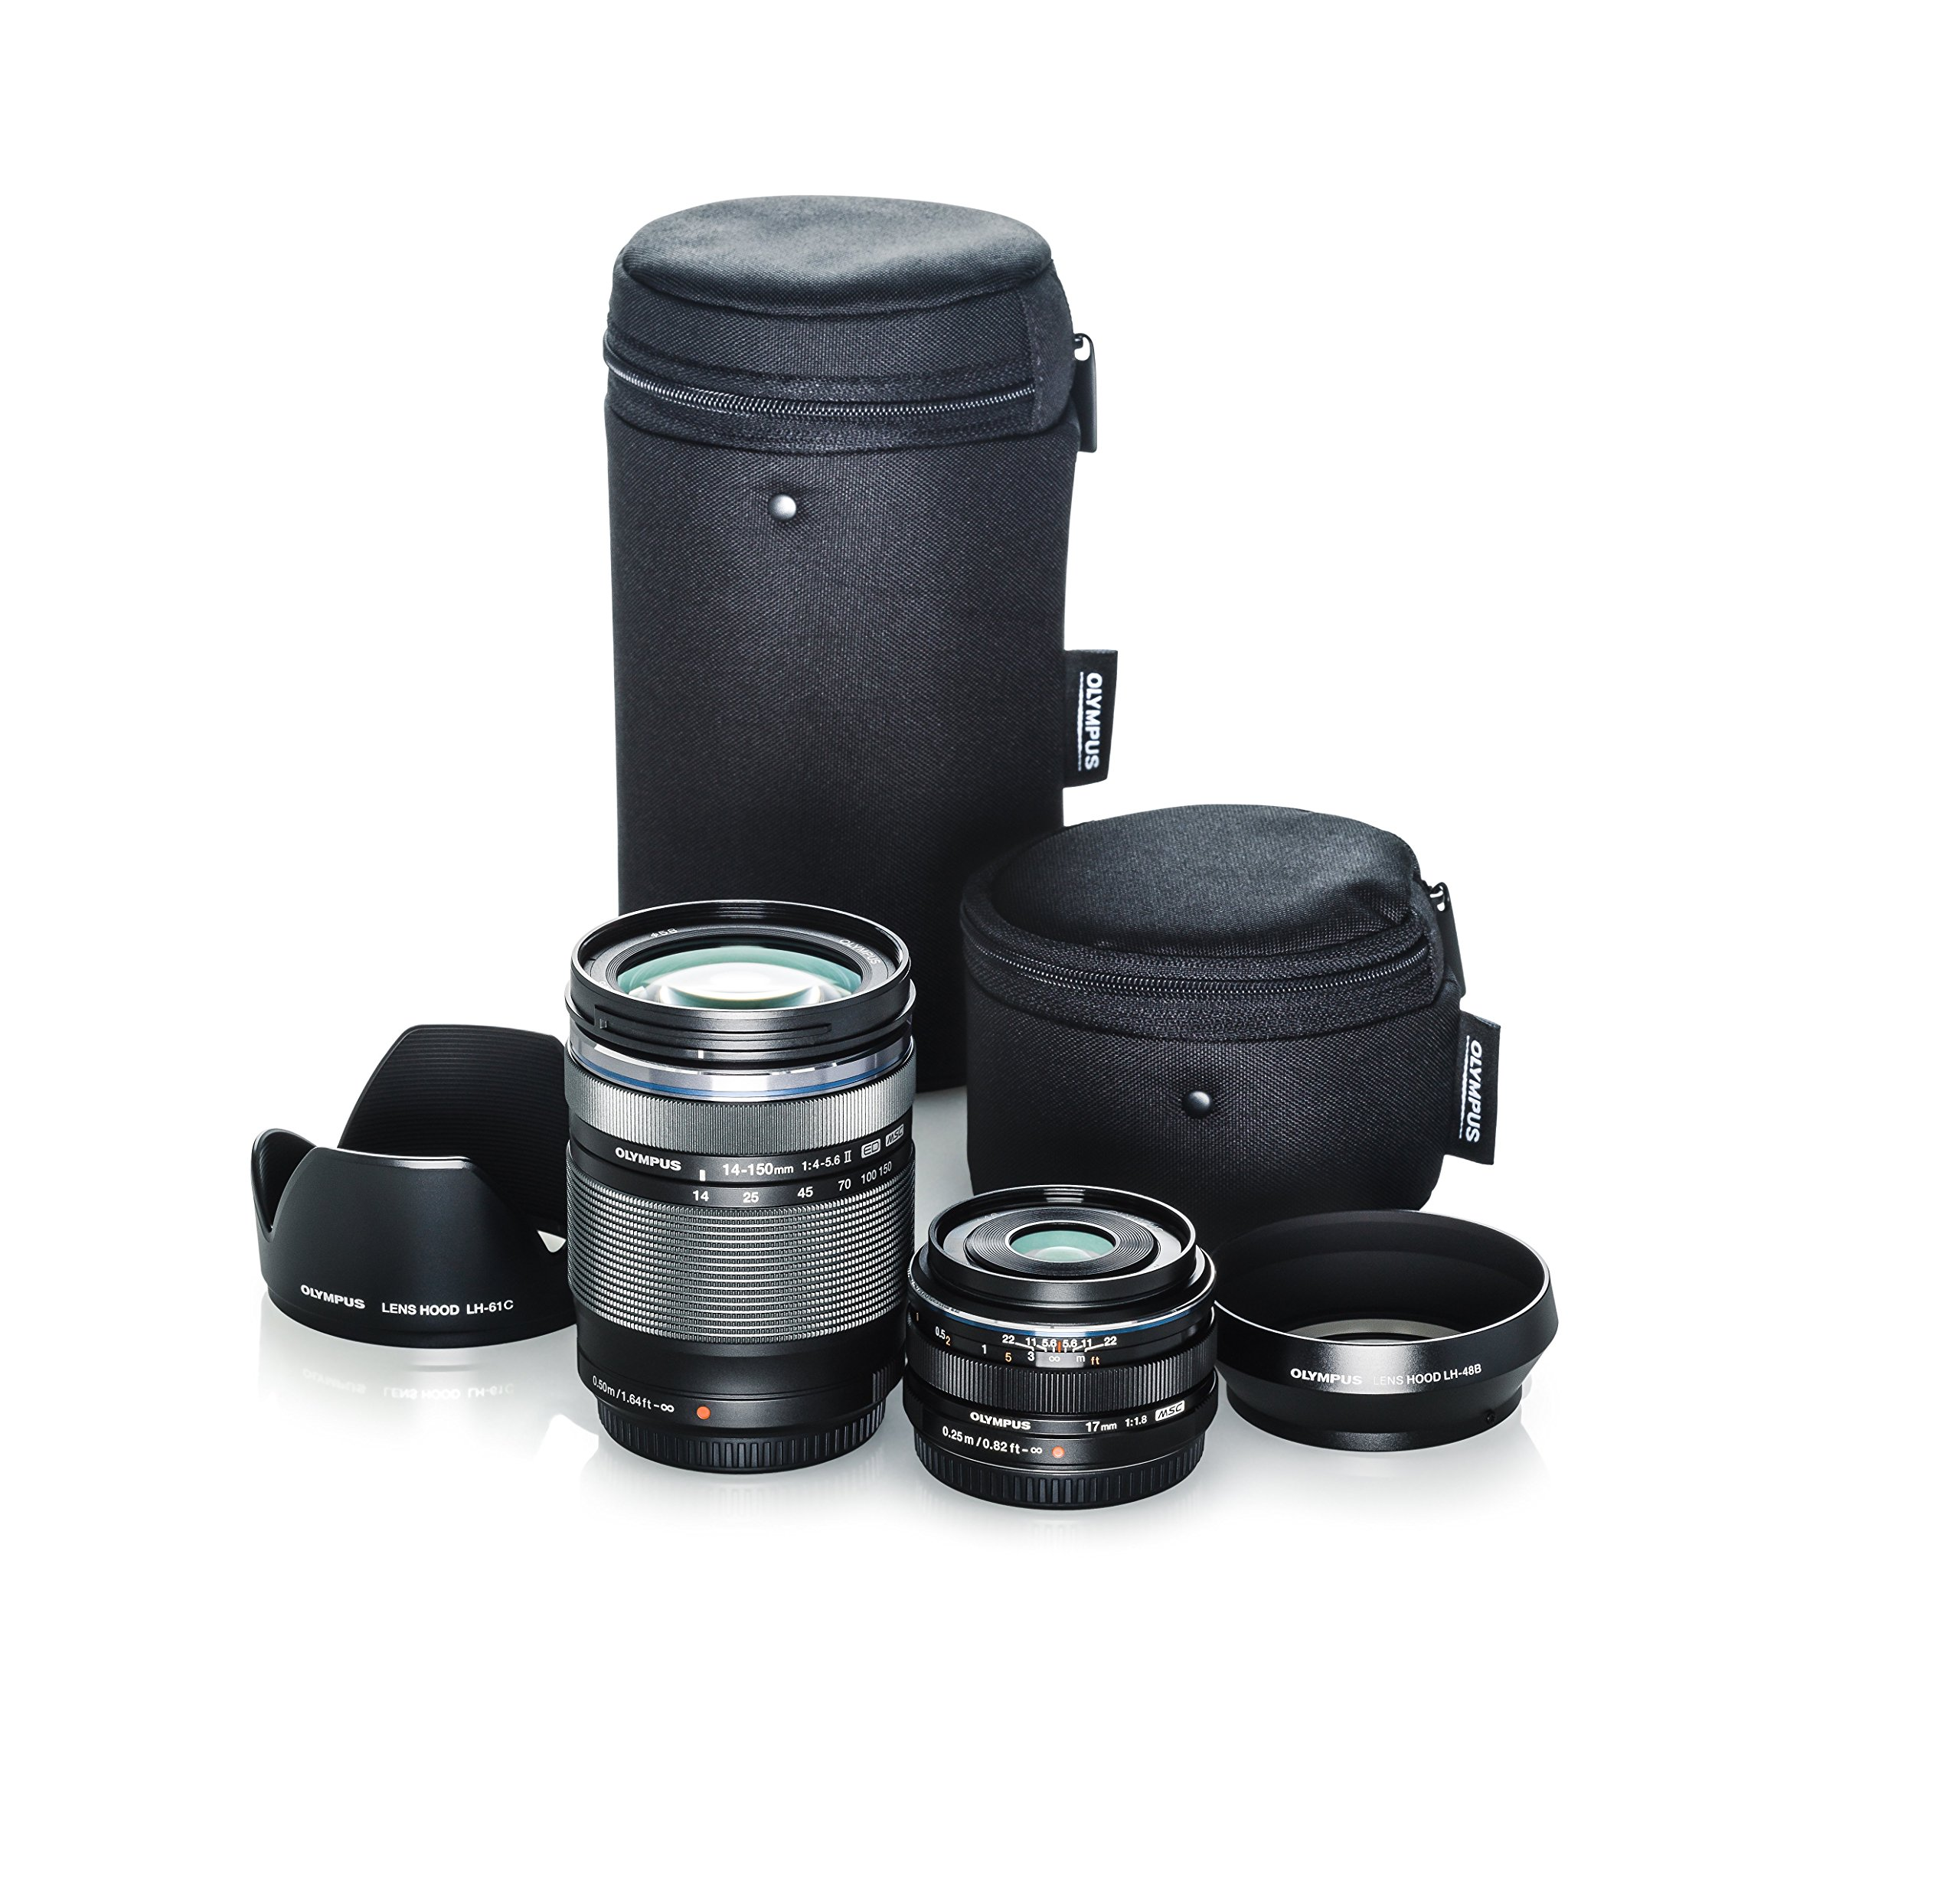 Olympus Travel Lens Kit (M.Zuiko 14-150mm f4.0-5.6 II and M.Zuiko 17mm f1.8 black lenses) by Olympus